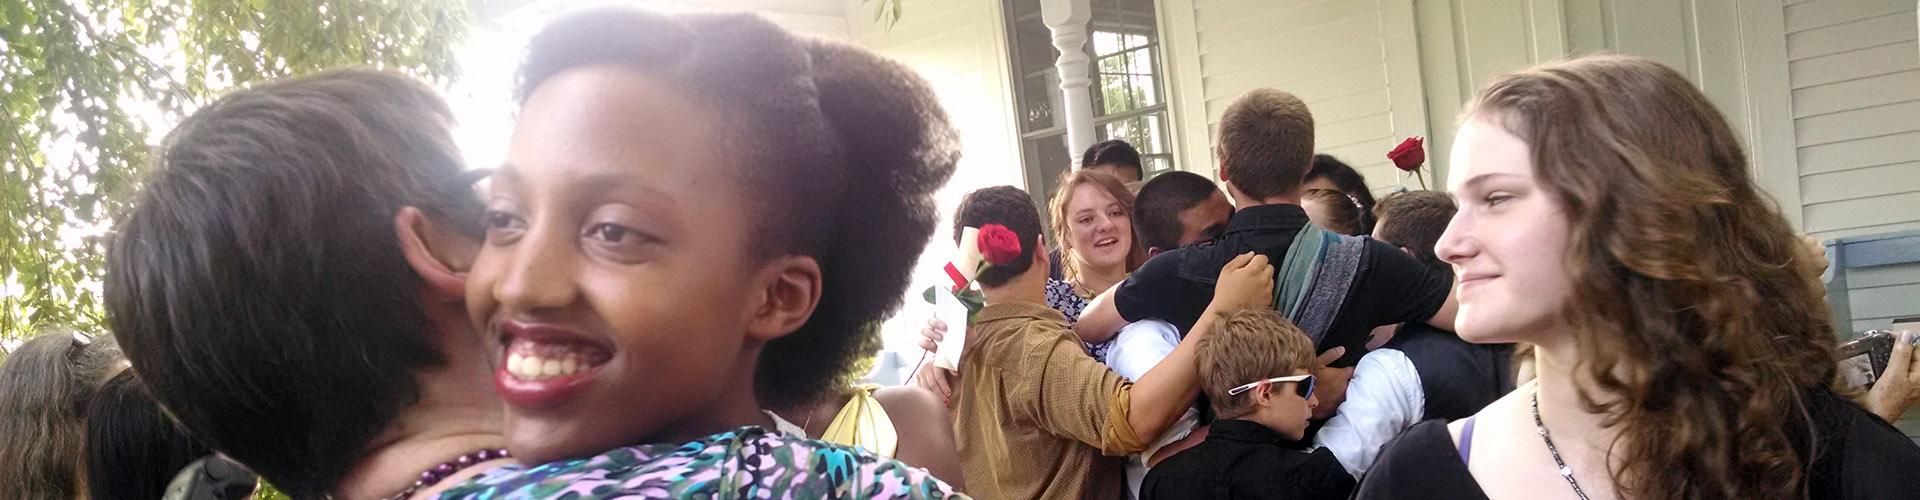 Scattergood graduation hug with Sharon